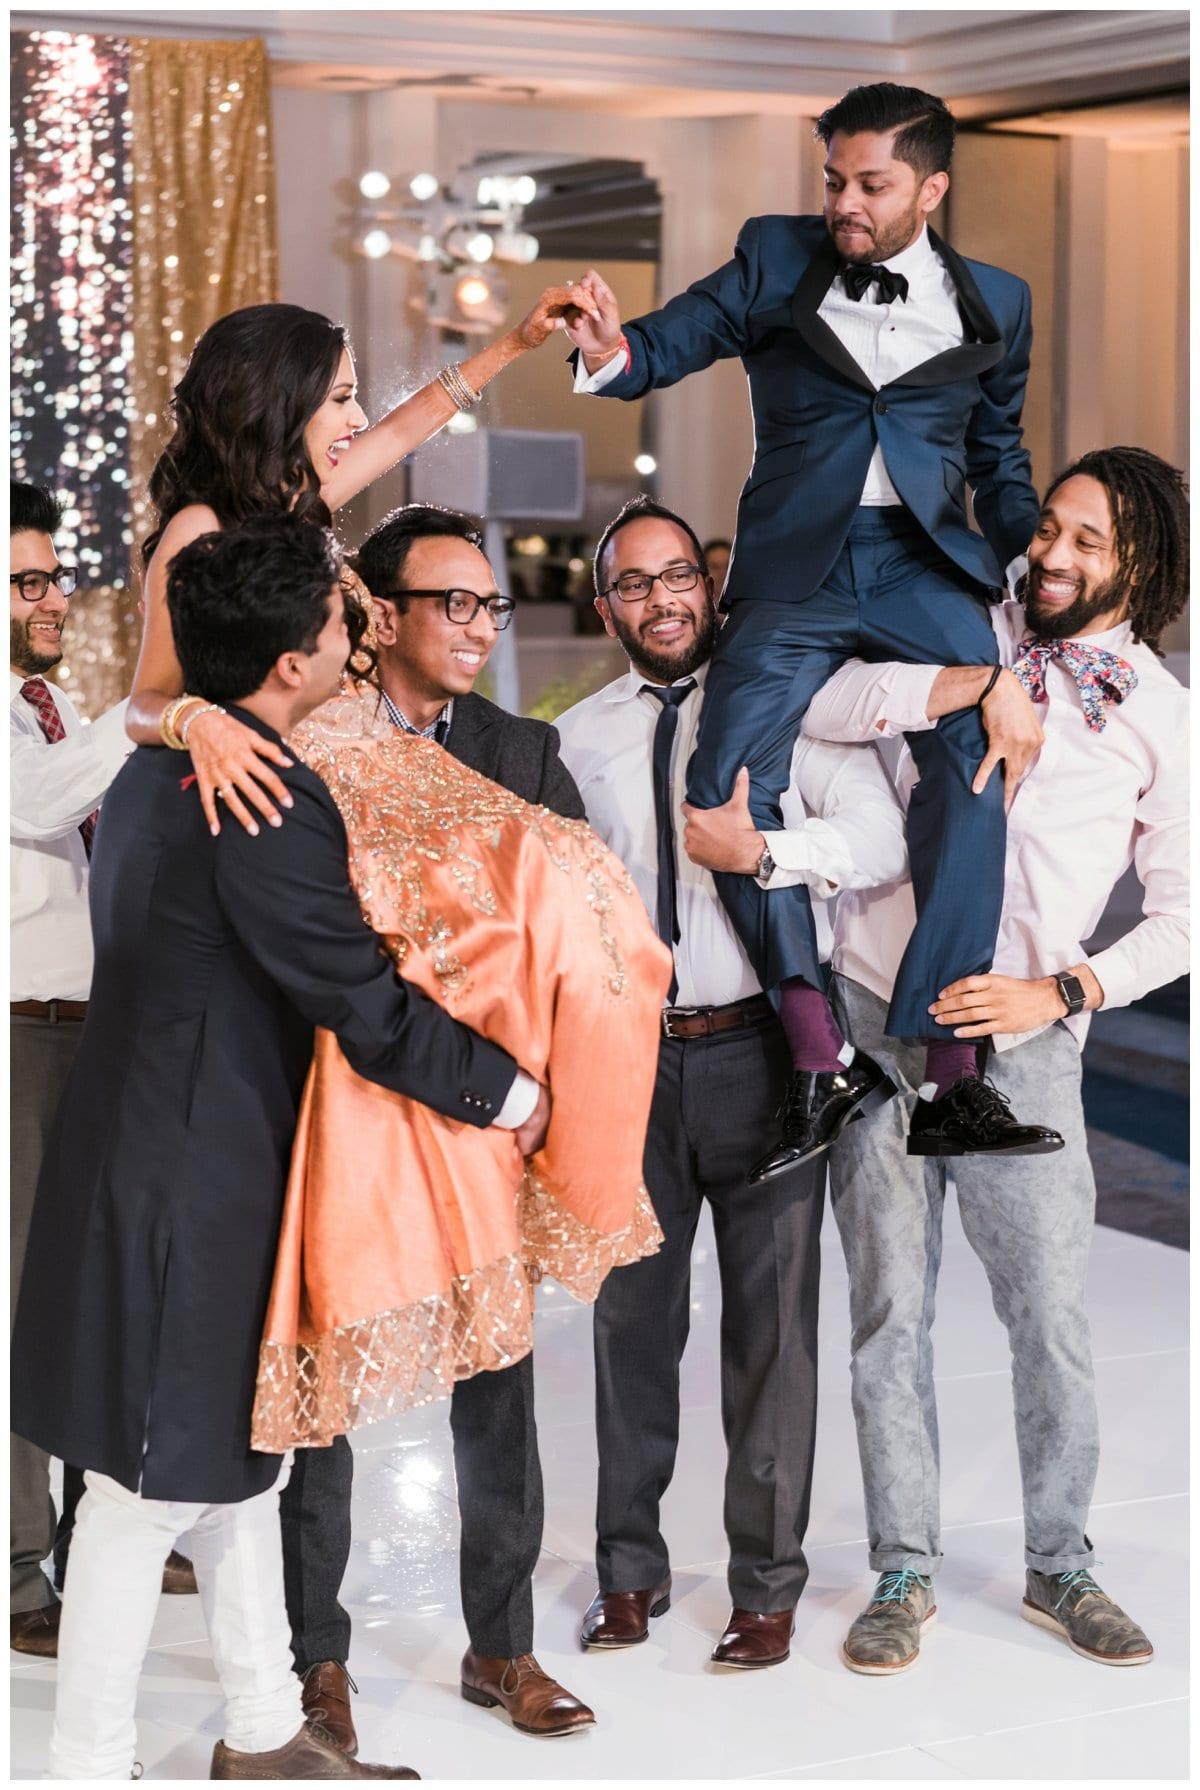 Hotel-Irvine-Indian-Wedding-Carissa-Woo-Photography_0103.jpg